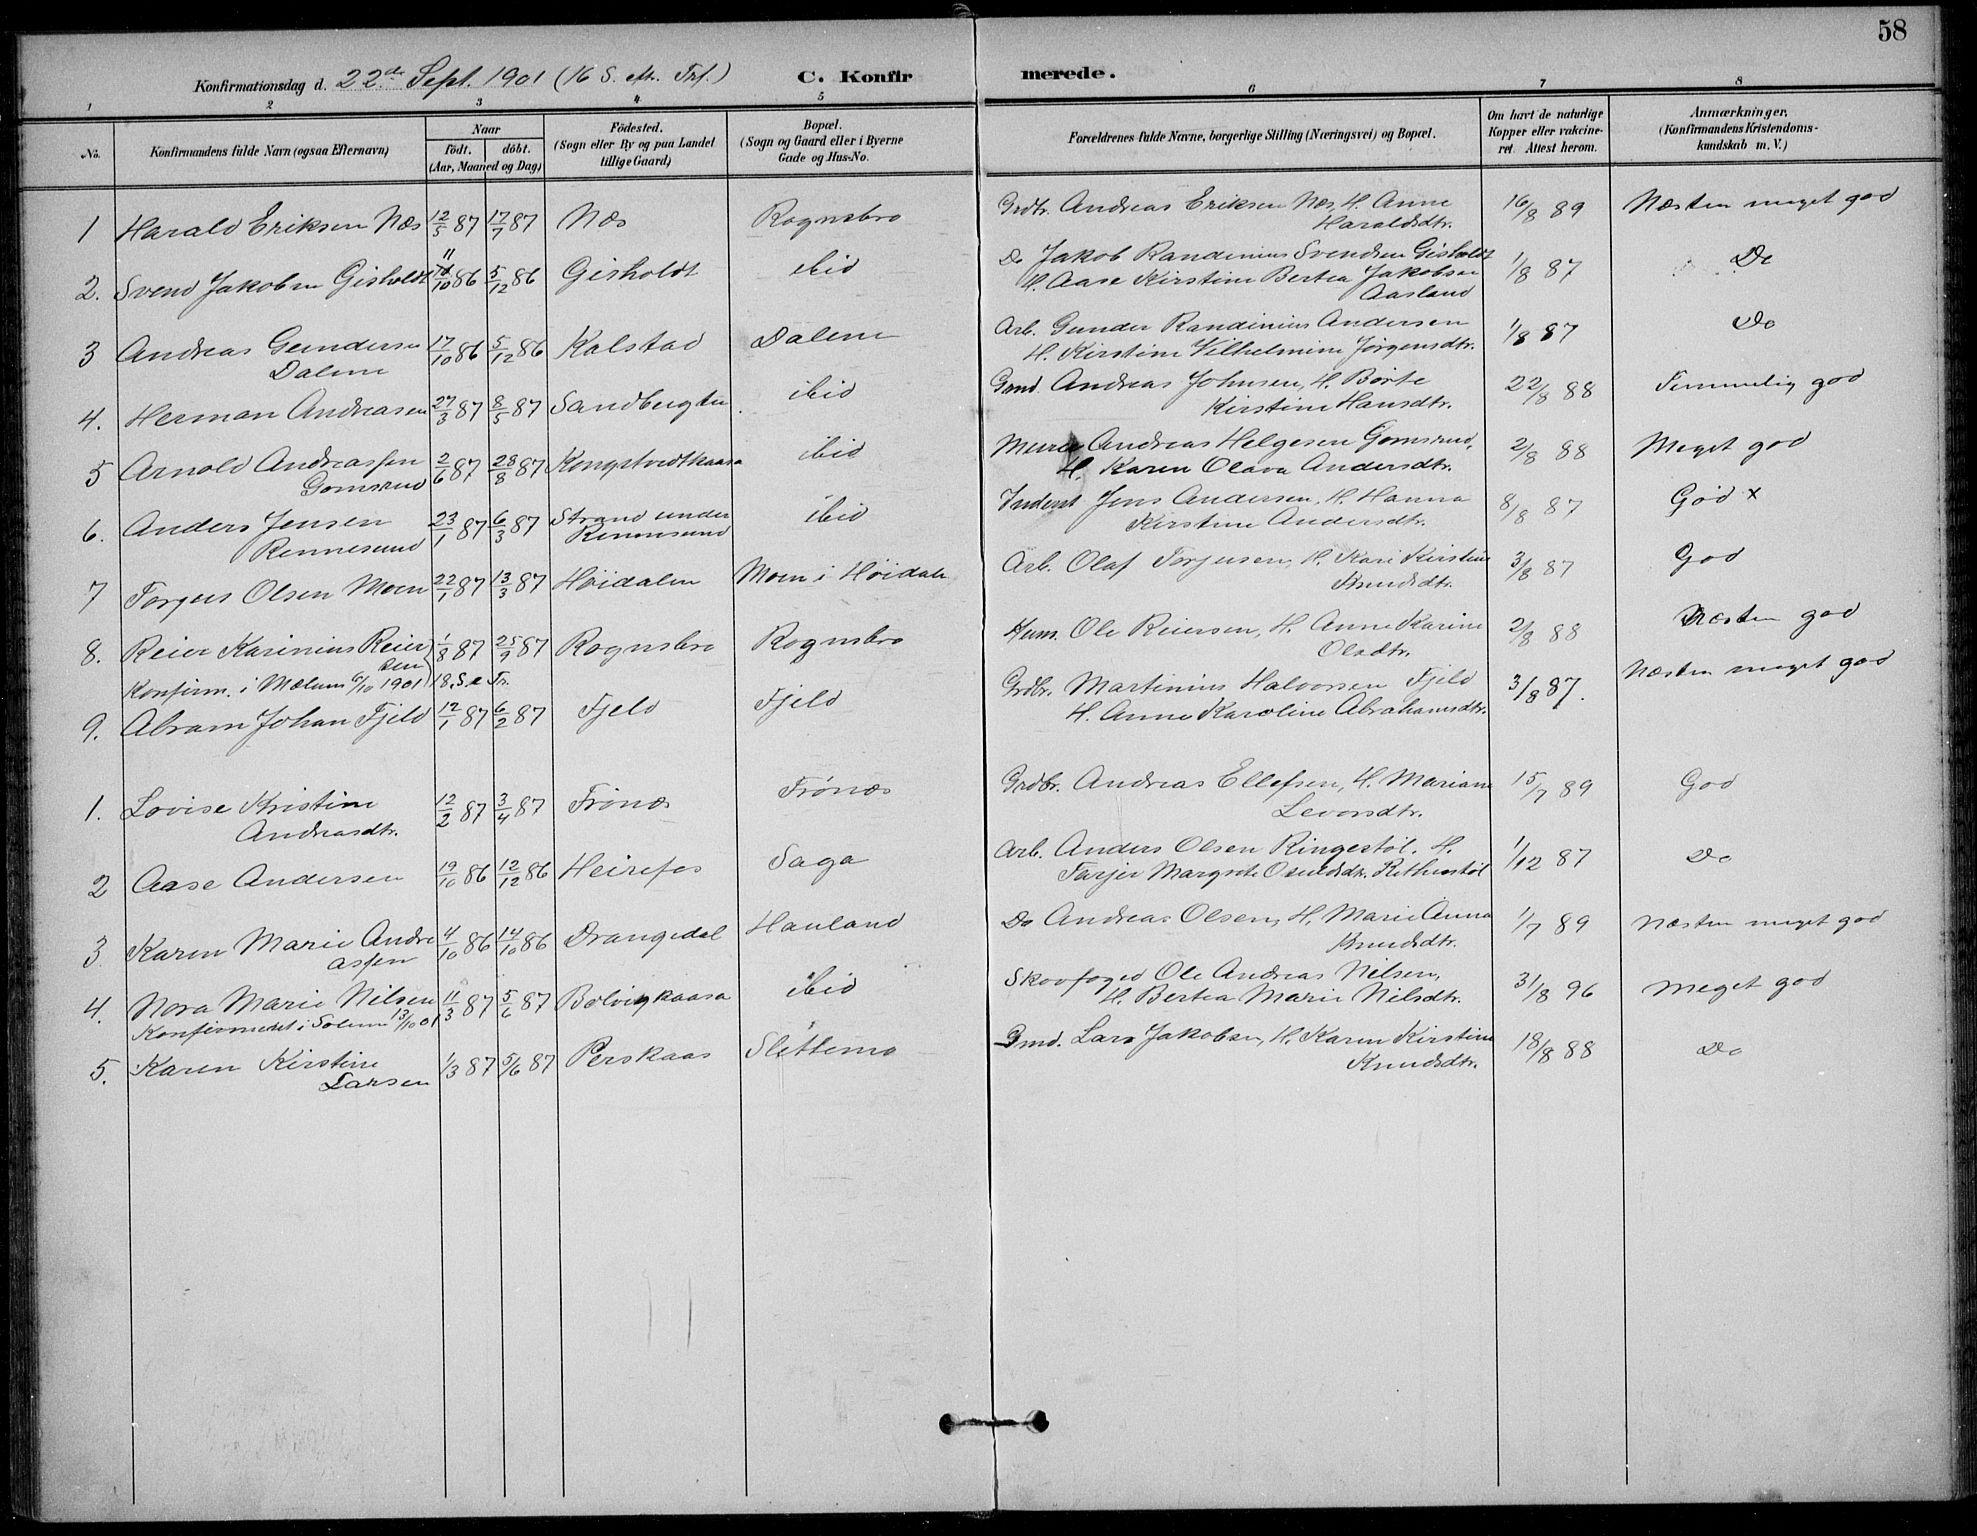 SAKO, Solum kirkebøker, F/Fc/L0002: Ministerialbok nr. III 2, 1892-1906, s. 58